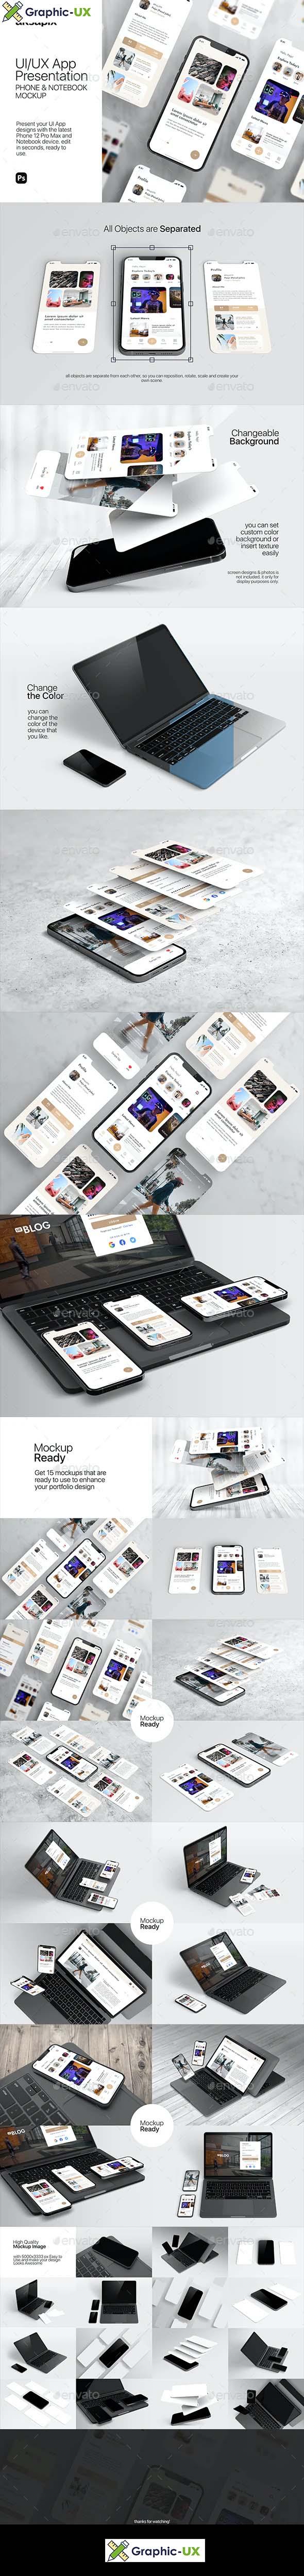 UIUX App Presentation Phone & Notebook Mockup